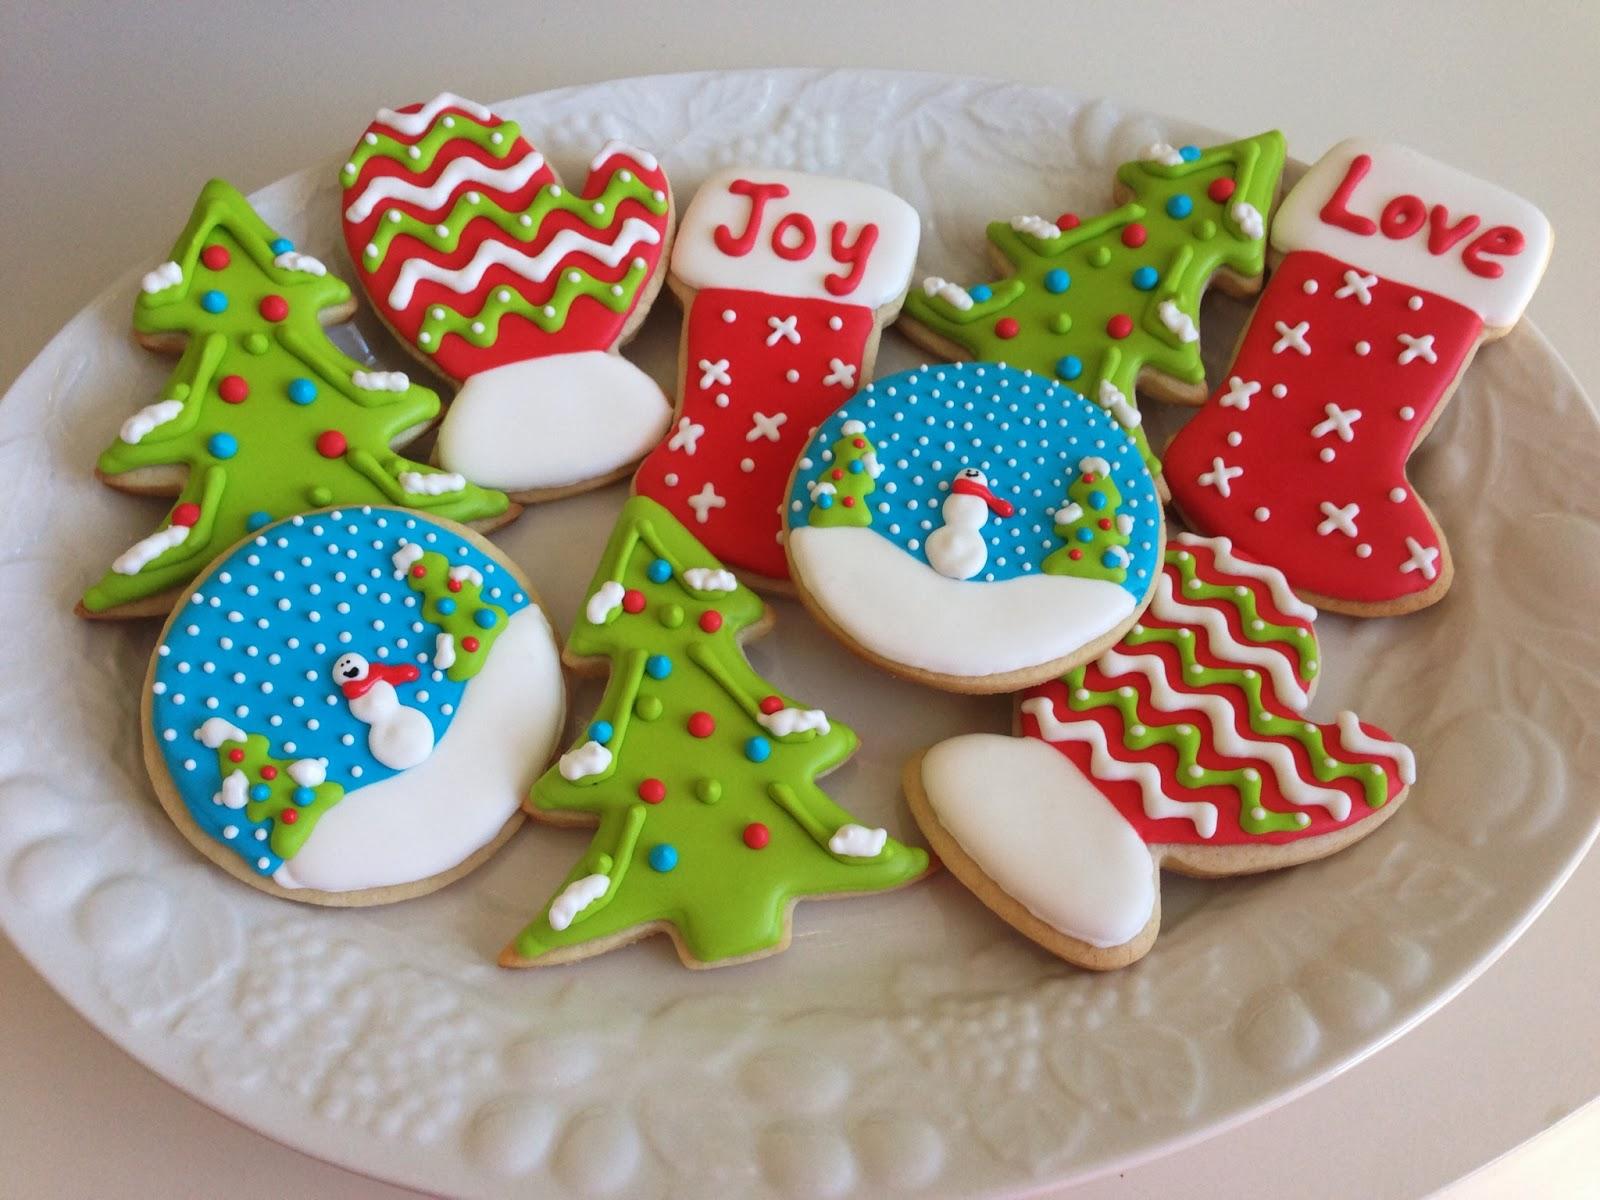 Christmas-Sugar-Cookies-With-Royal-Icing-02